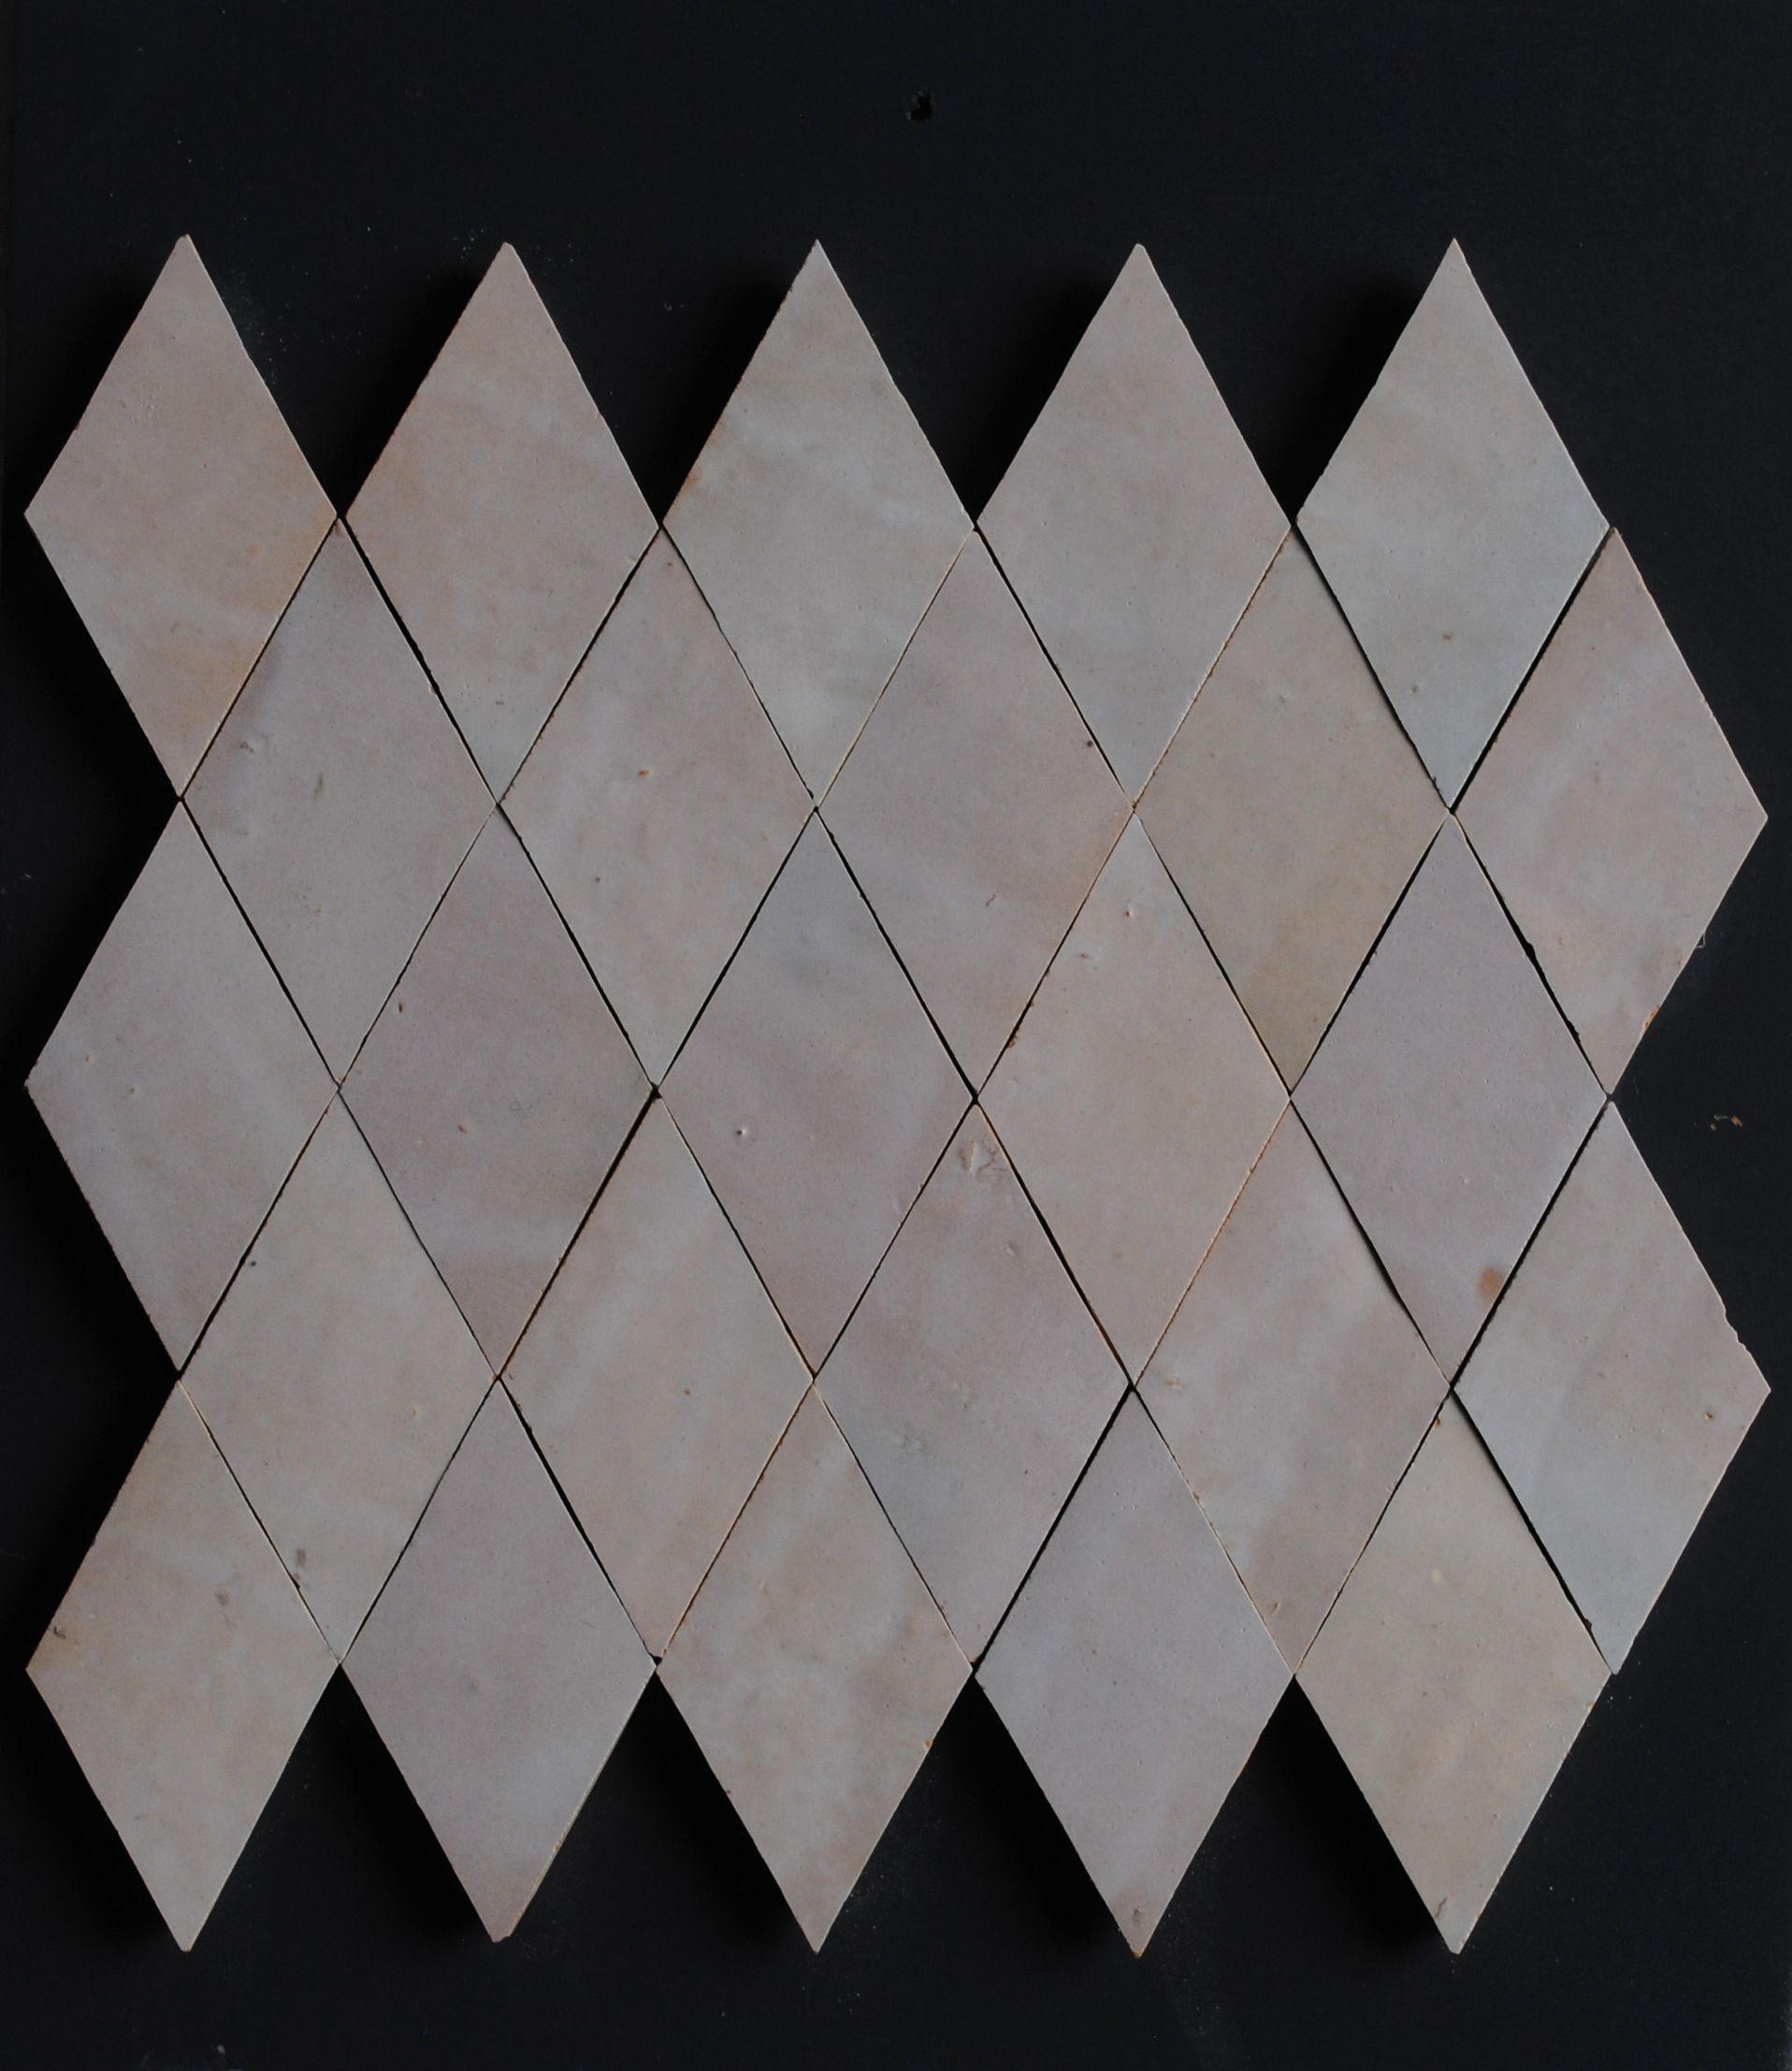 Diamond Zellij Tile Hand Made Manufacture Http Www